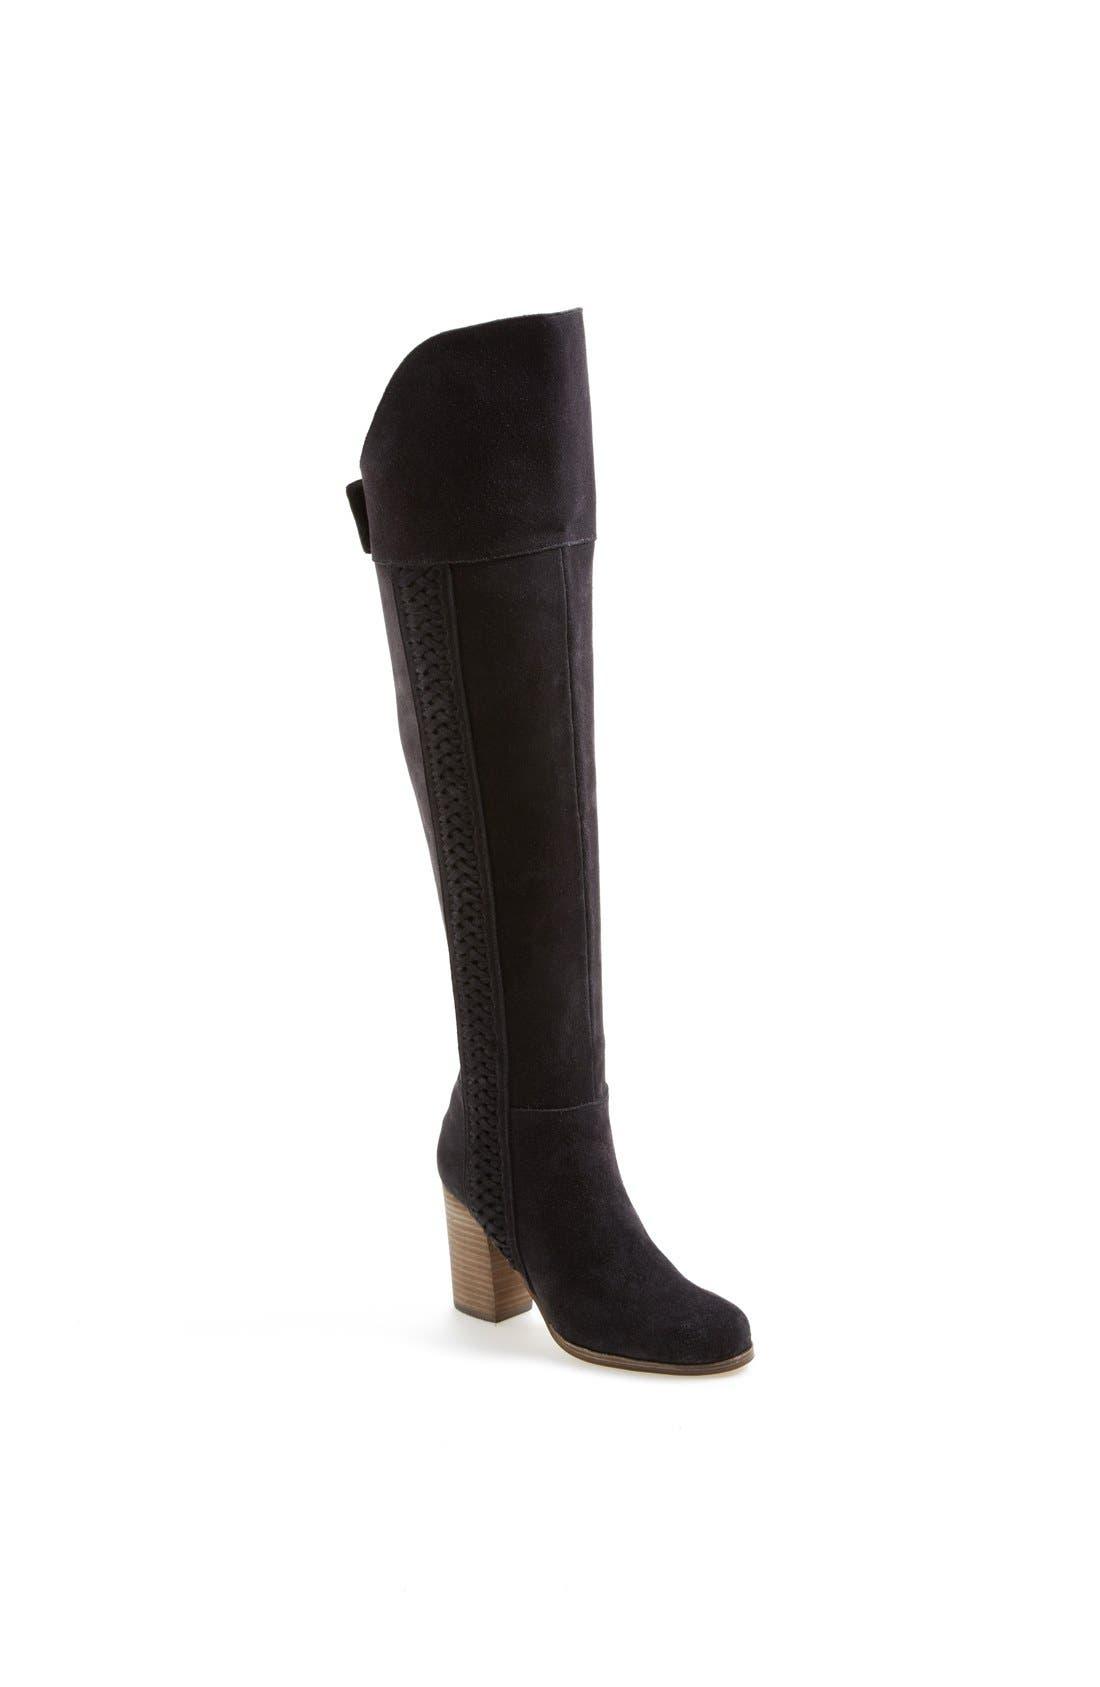 Alternate Image 1 Selected - DV by Dolce Vita 'Myer' Over the Knee Boot (Women)